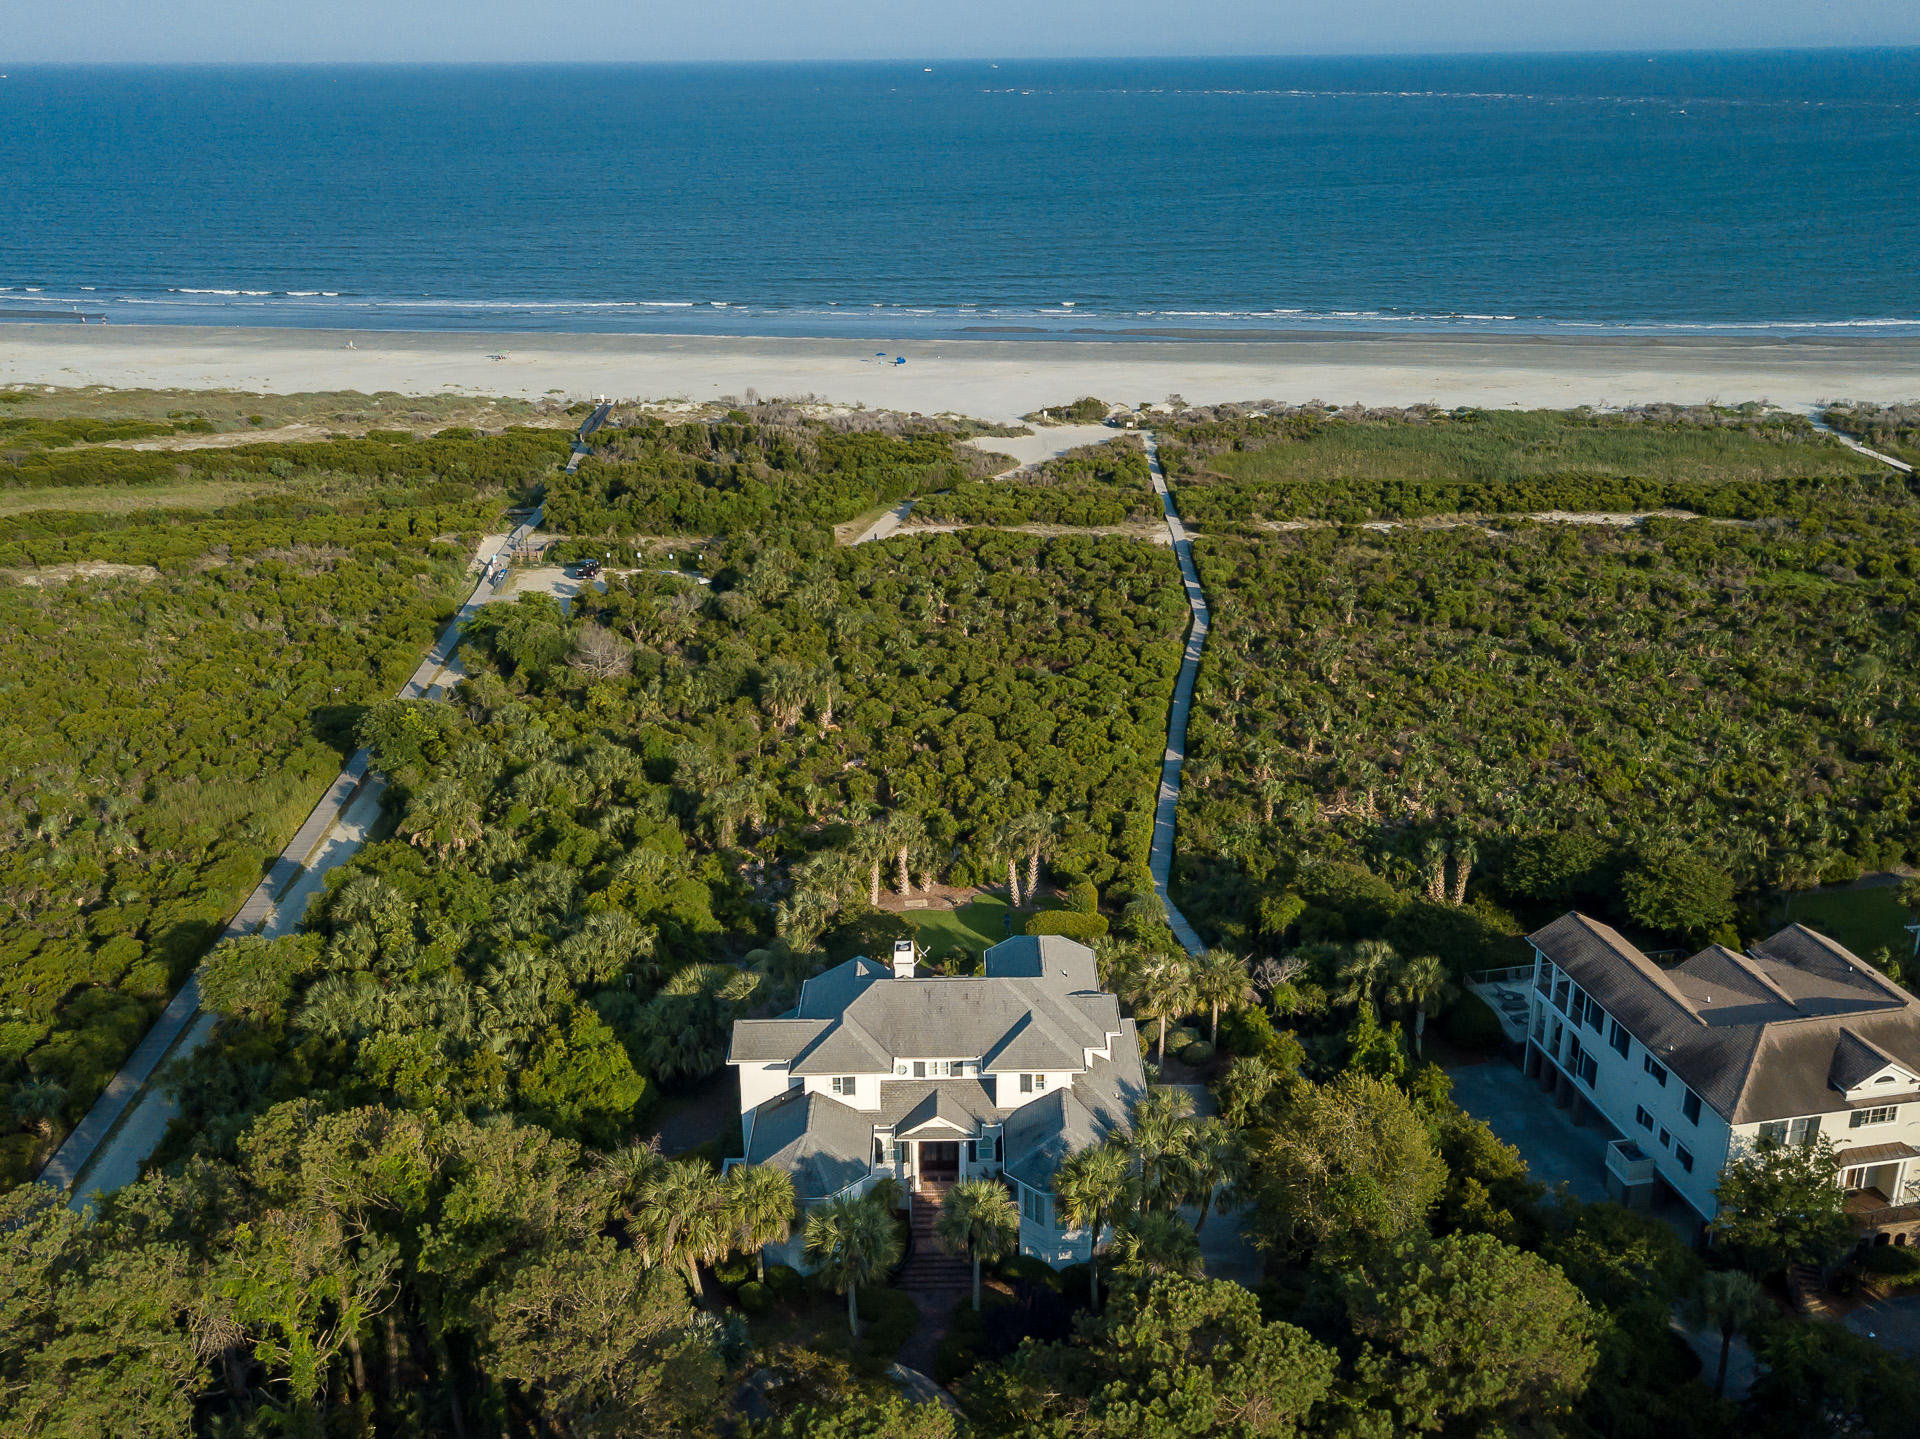 Seabrook Island Homes For Sale - 2216 Rolling Dune, Seabrook Island, SC - 81